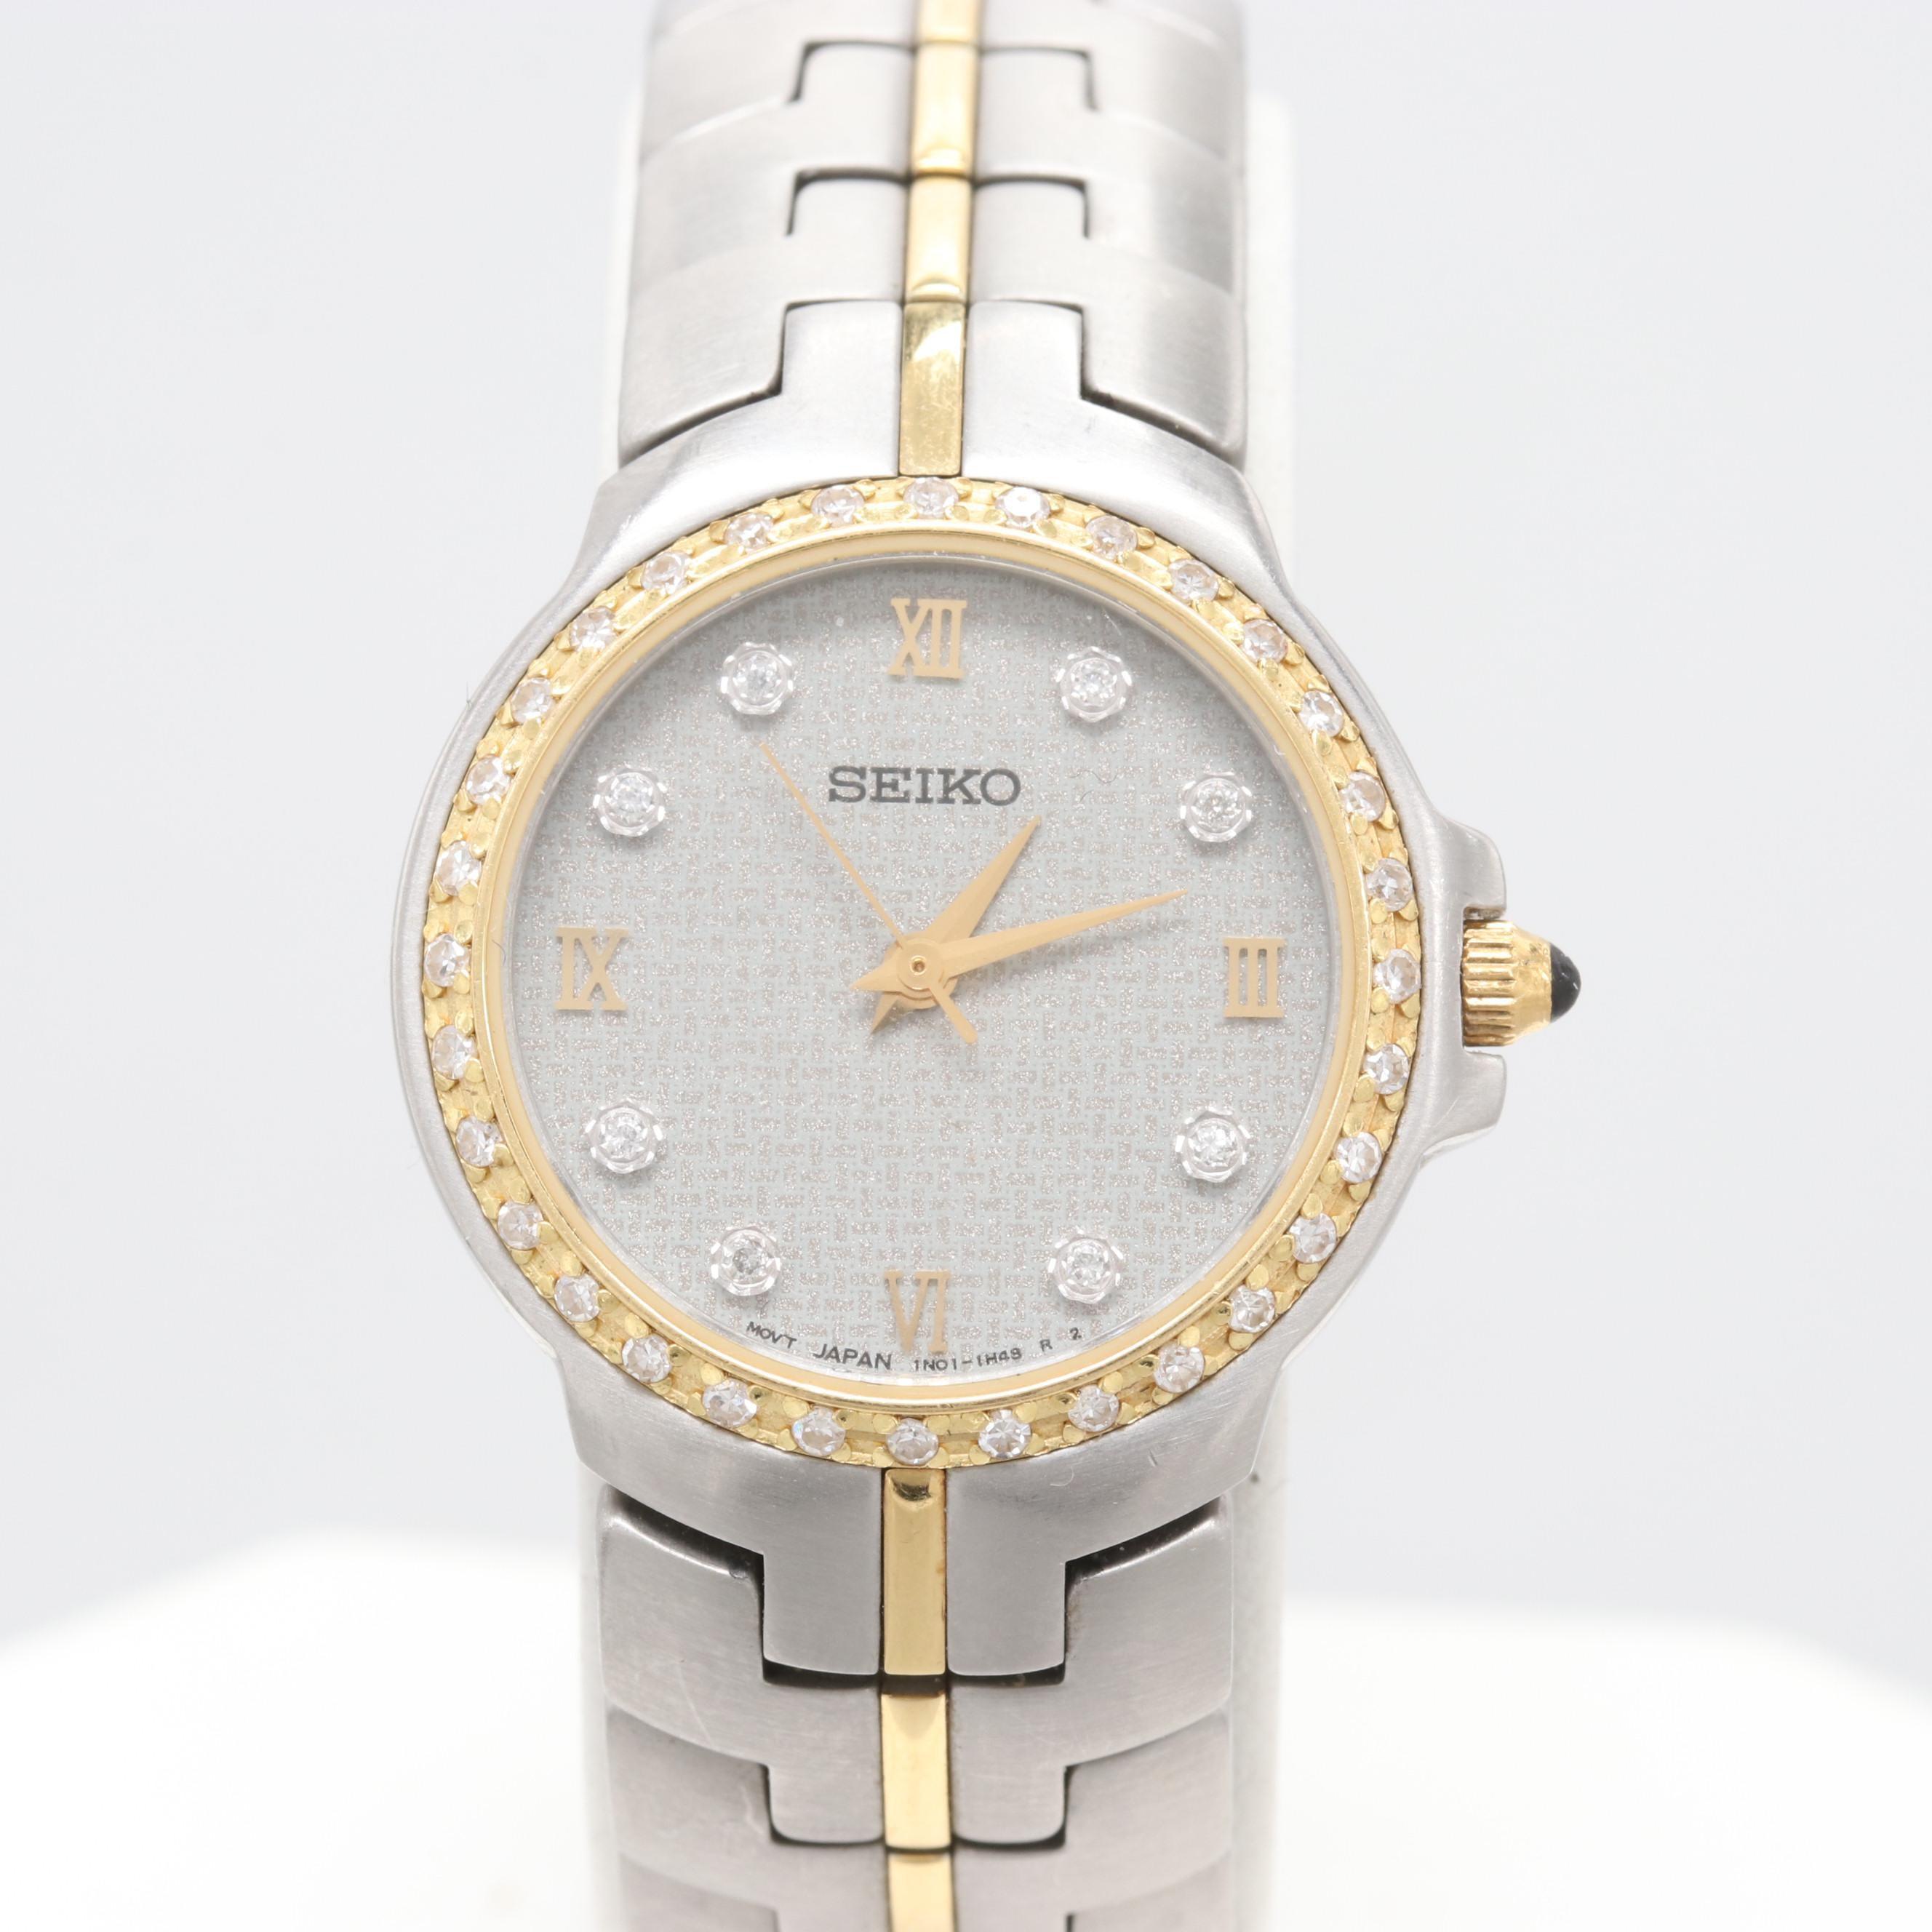 Seiko 18K Yellow Gold and Stainless Steel Diamond Wristwatch